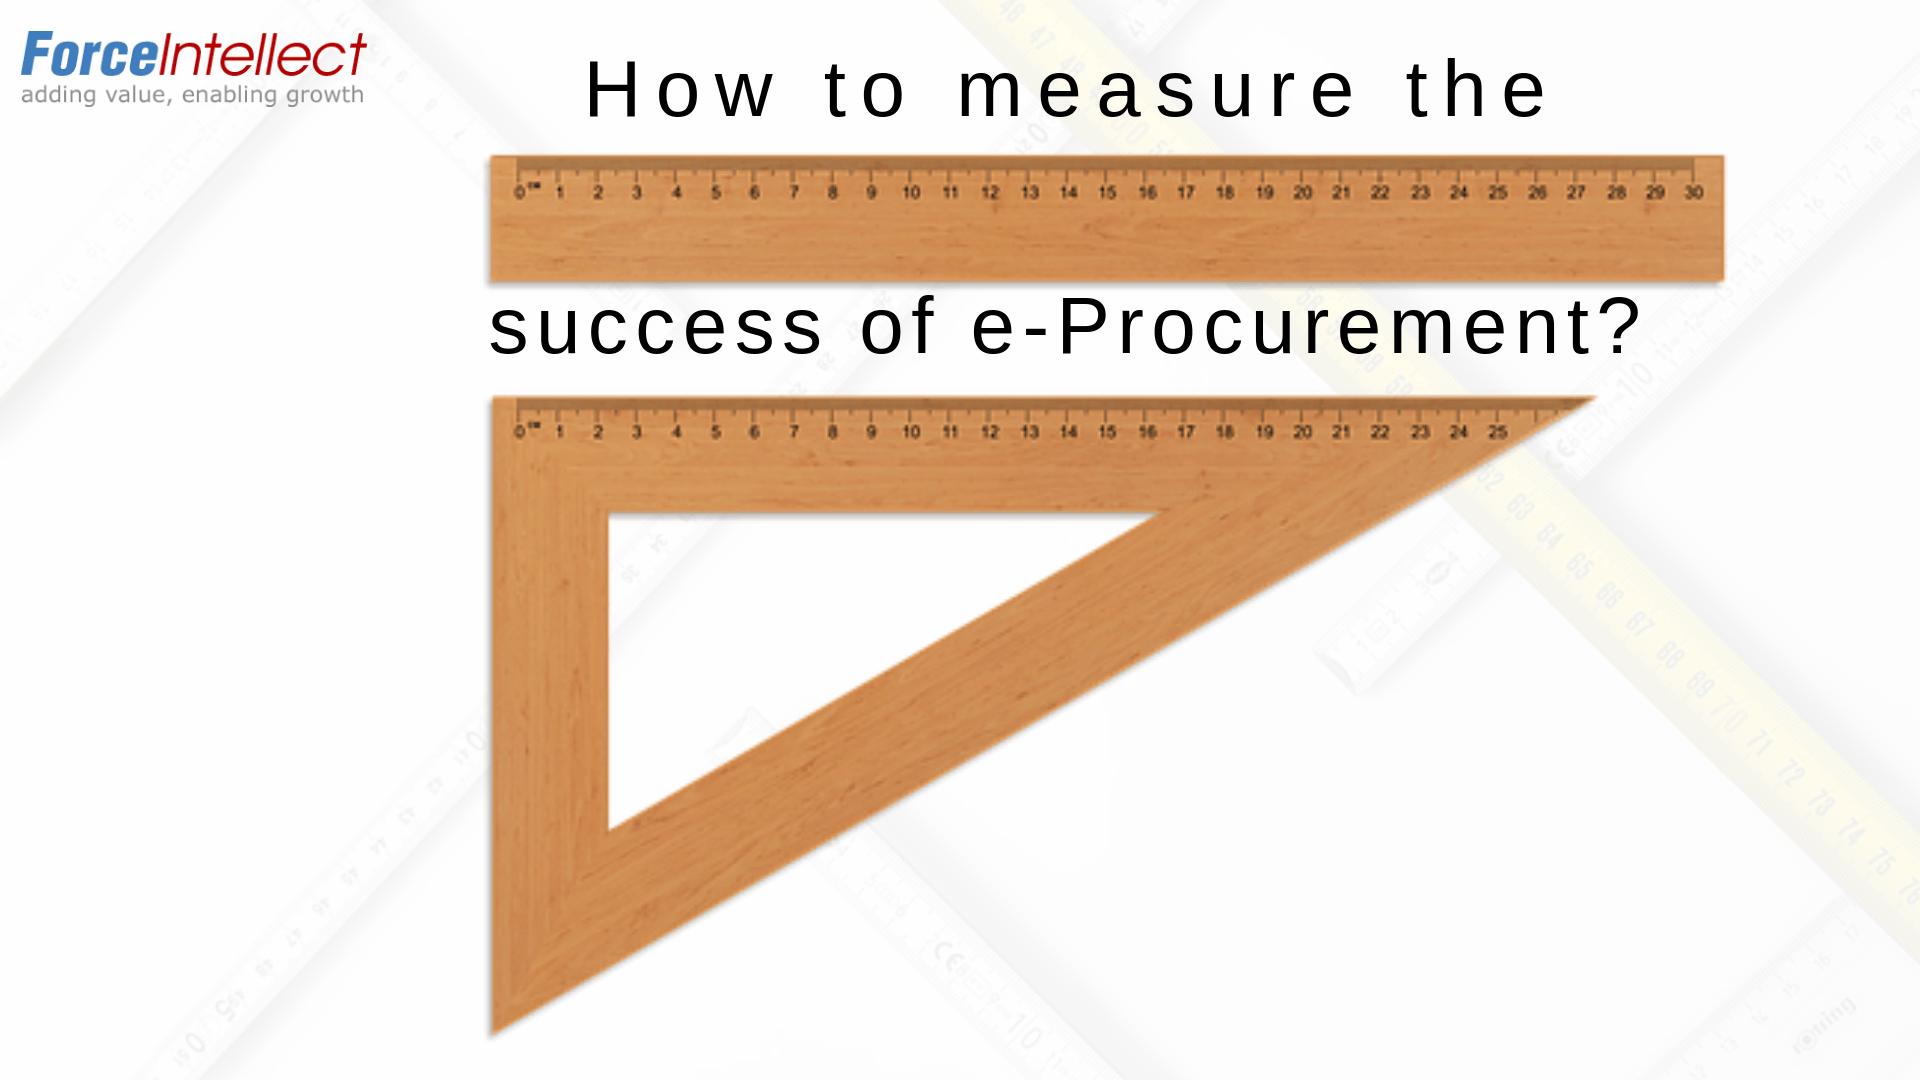 How to measure success of e-procurement